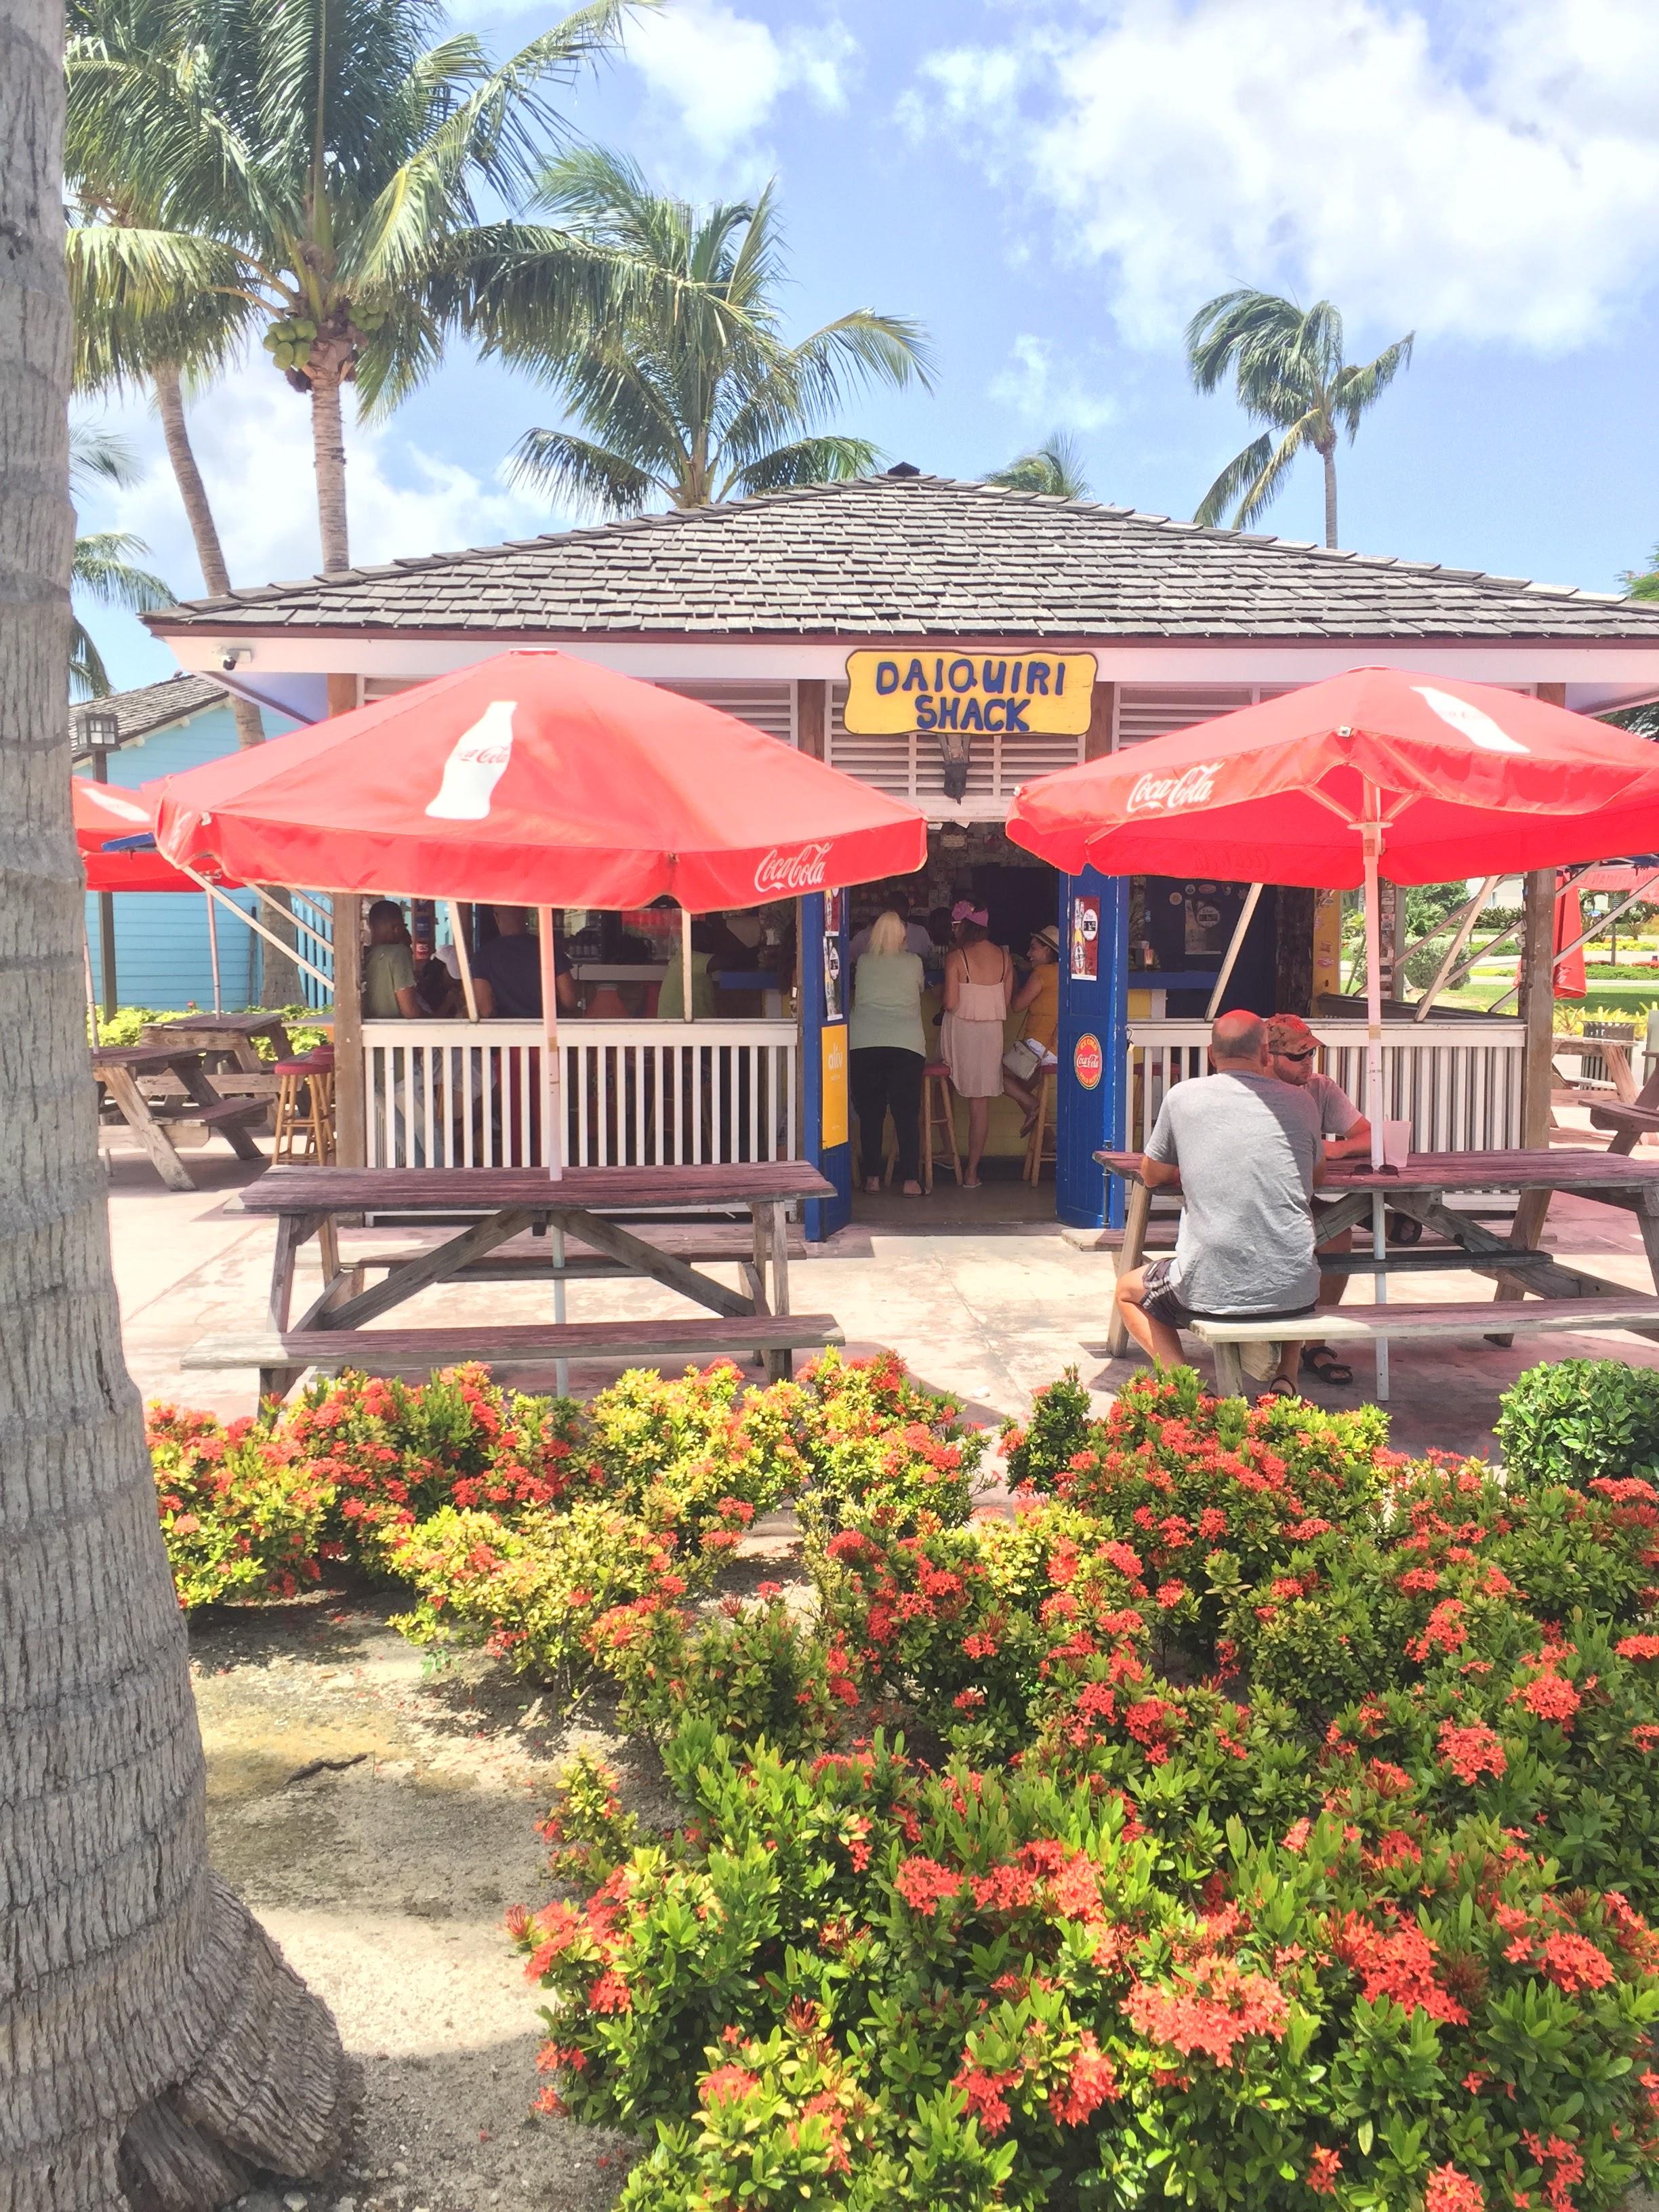 Daiquiri Shack The Bahamas